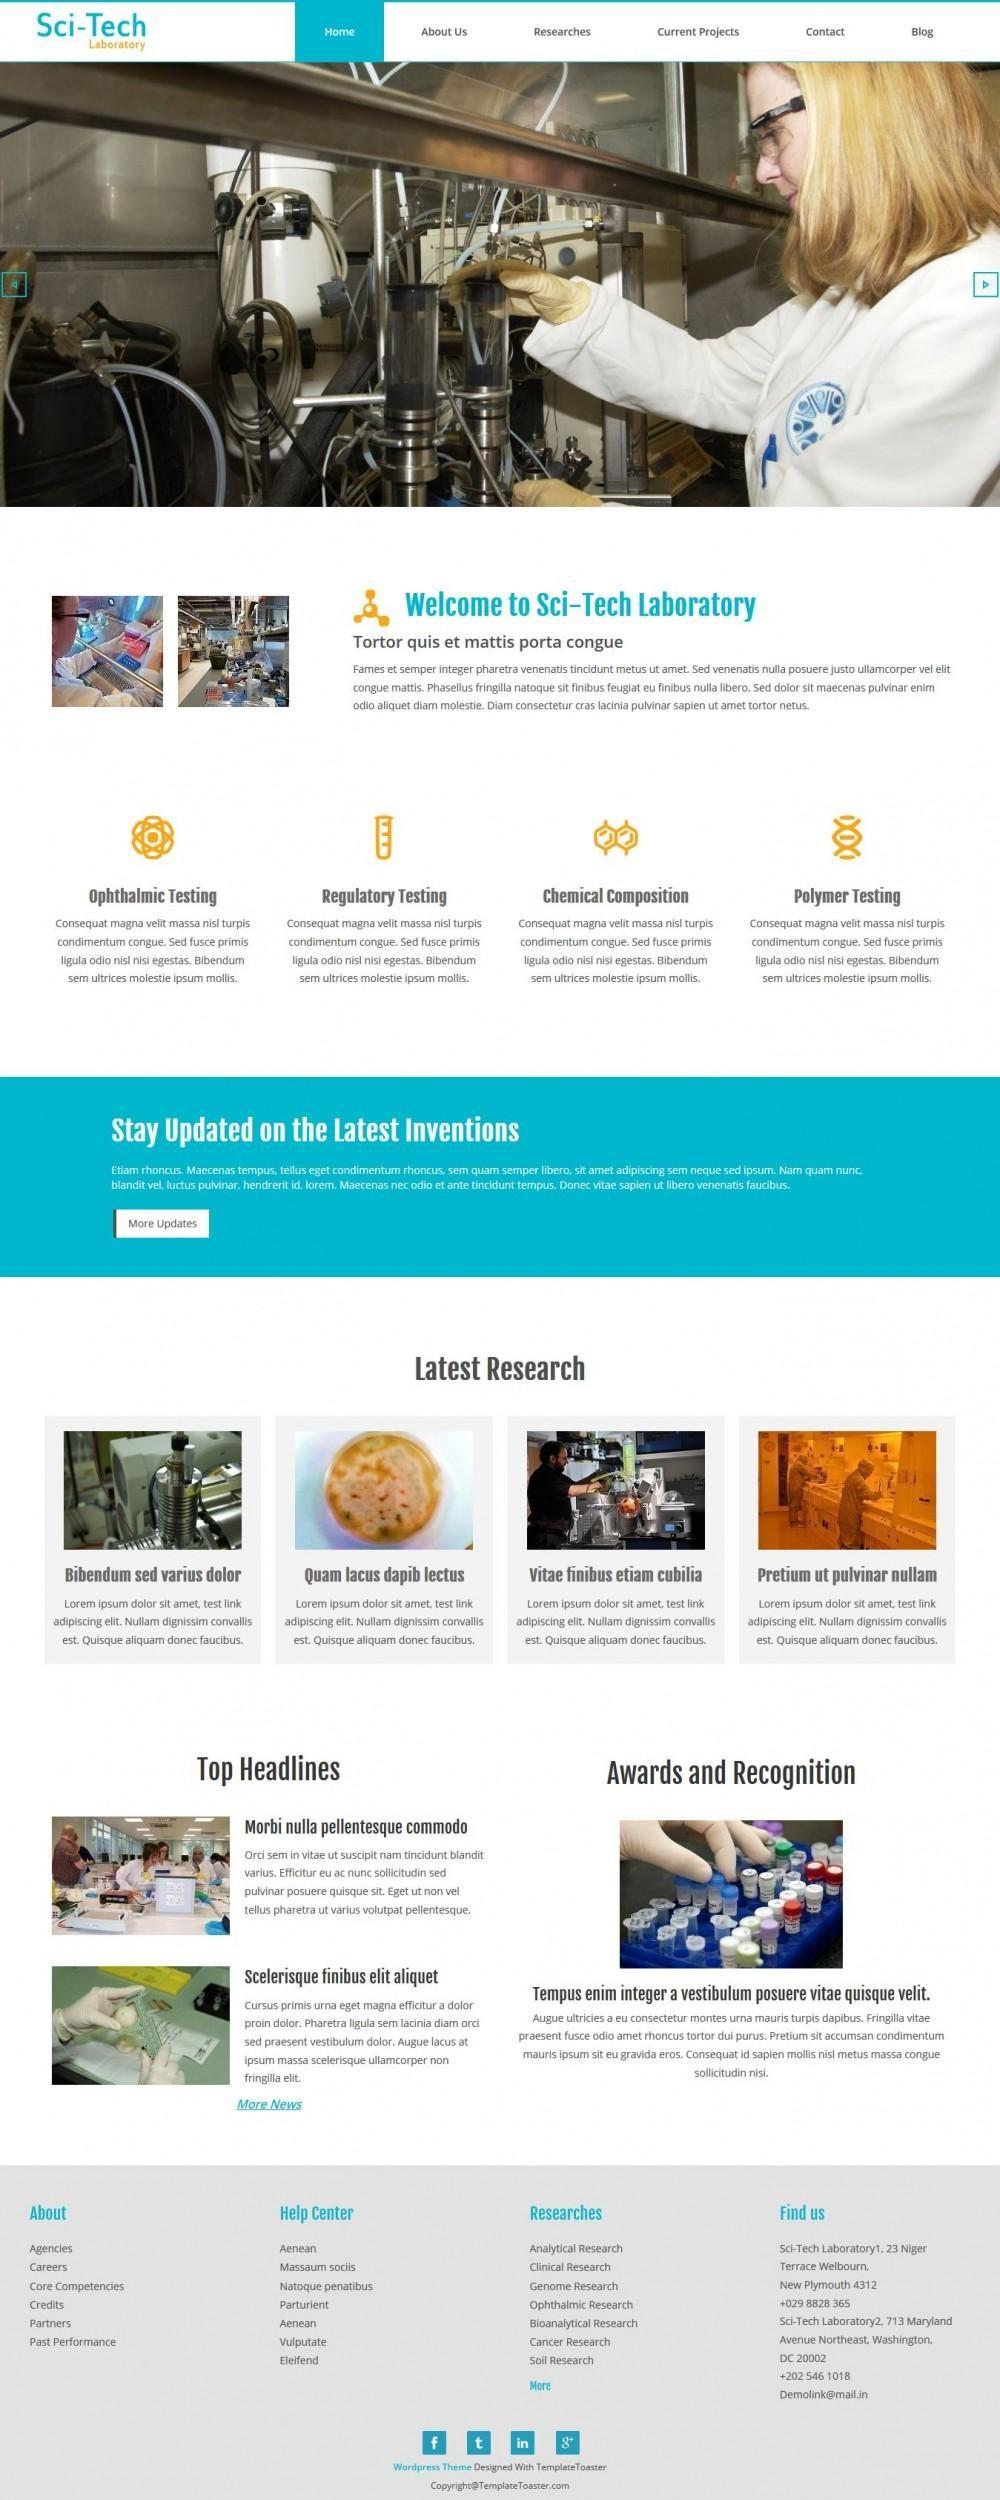 Sci-Tech Laboratory - Responsive Joomla Template for Institutes/Labs